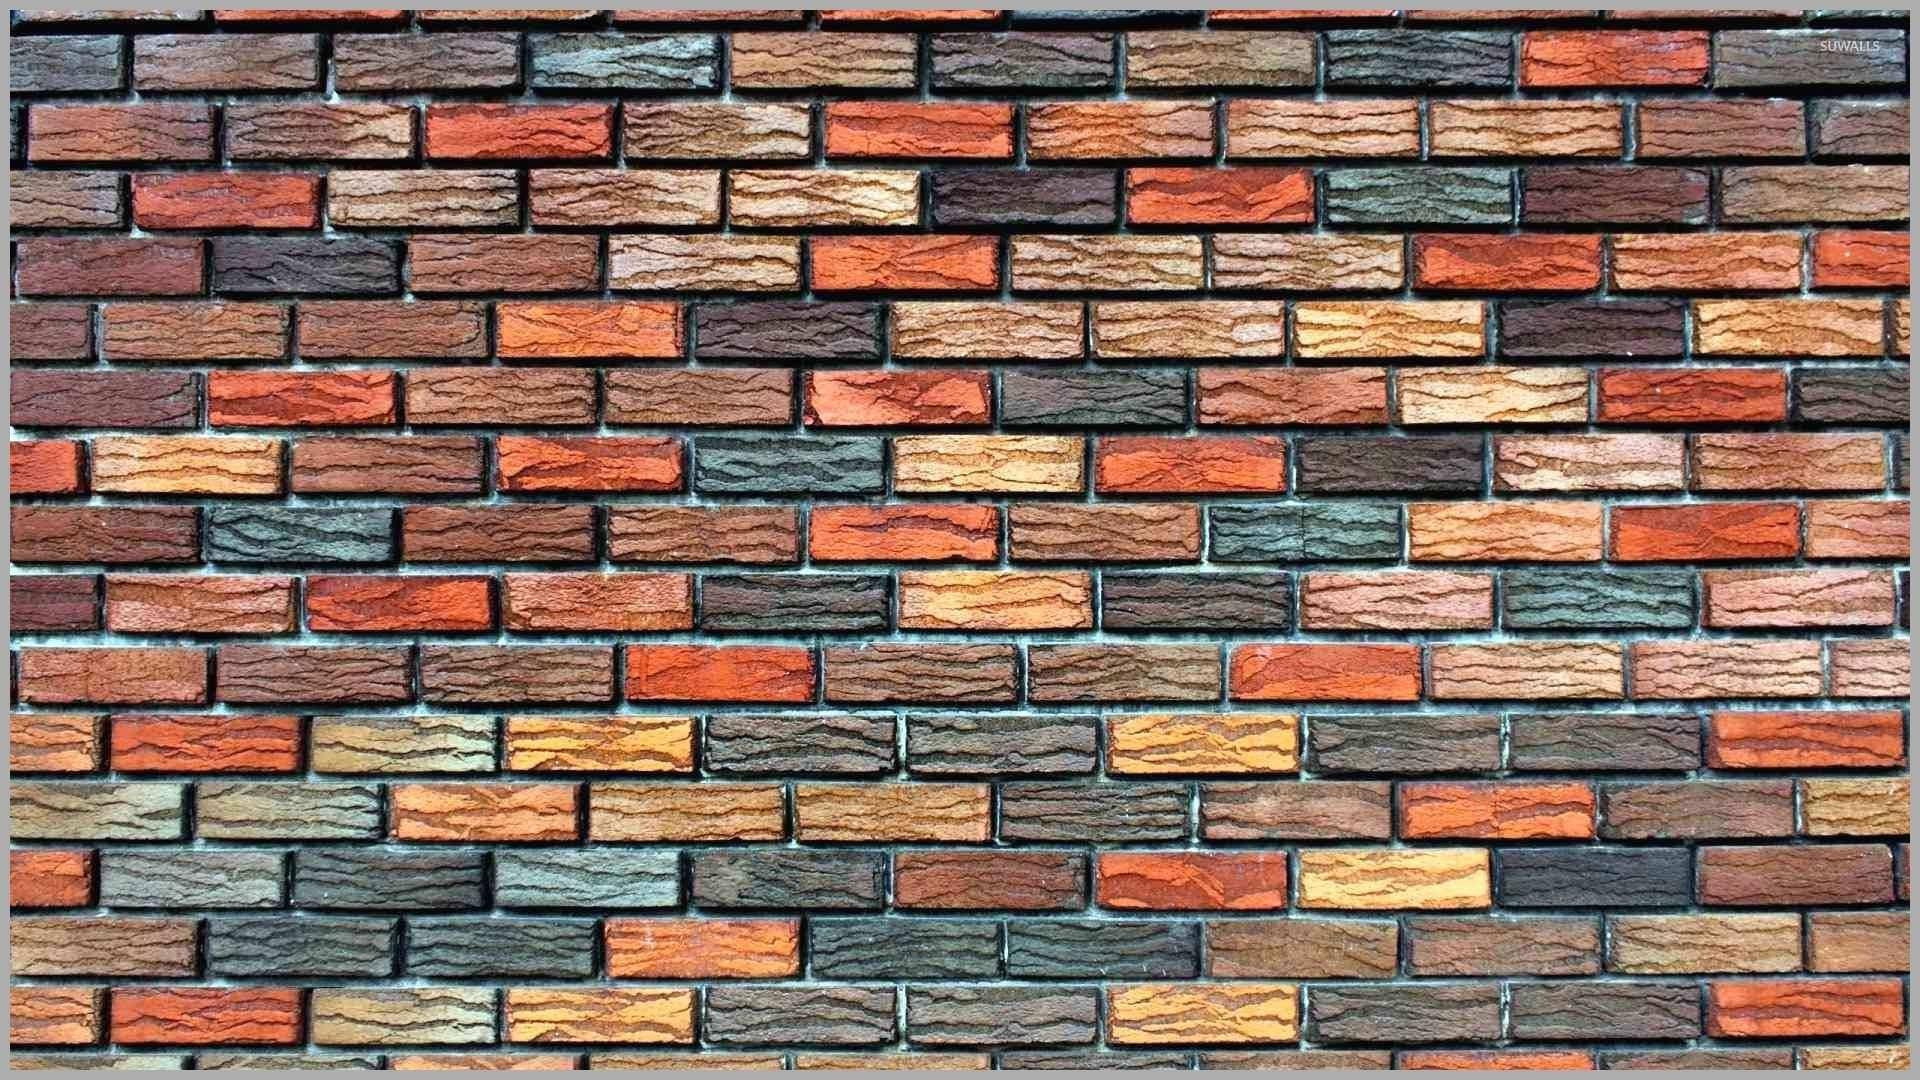 Brick Wallpaper Elegant Faux Stone Wallpaper Textured - High Resolution Brick Wall Background - HD Wallpaper